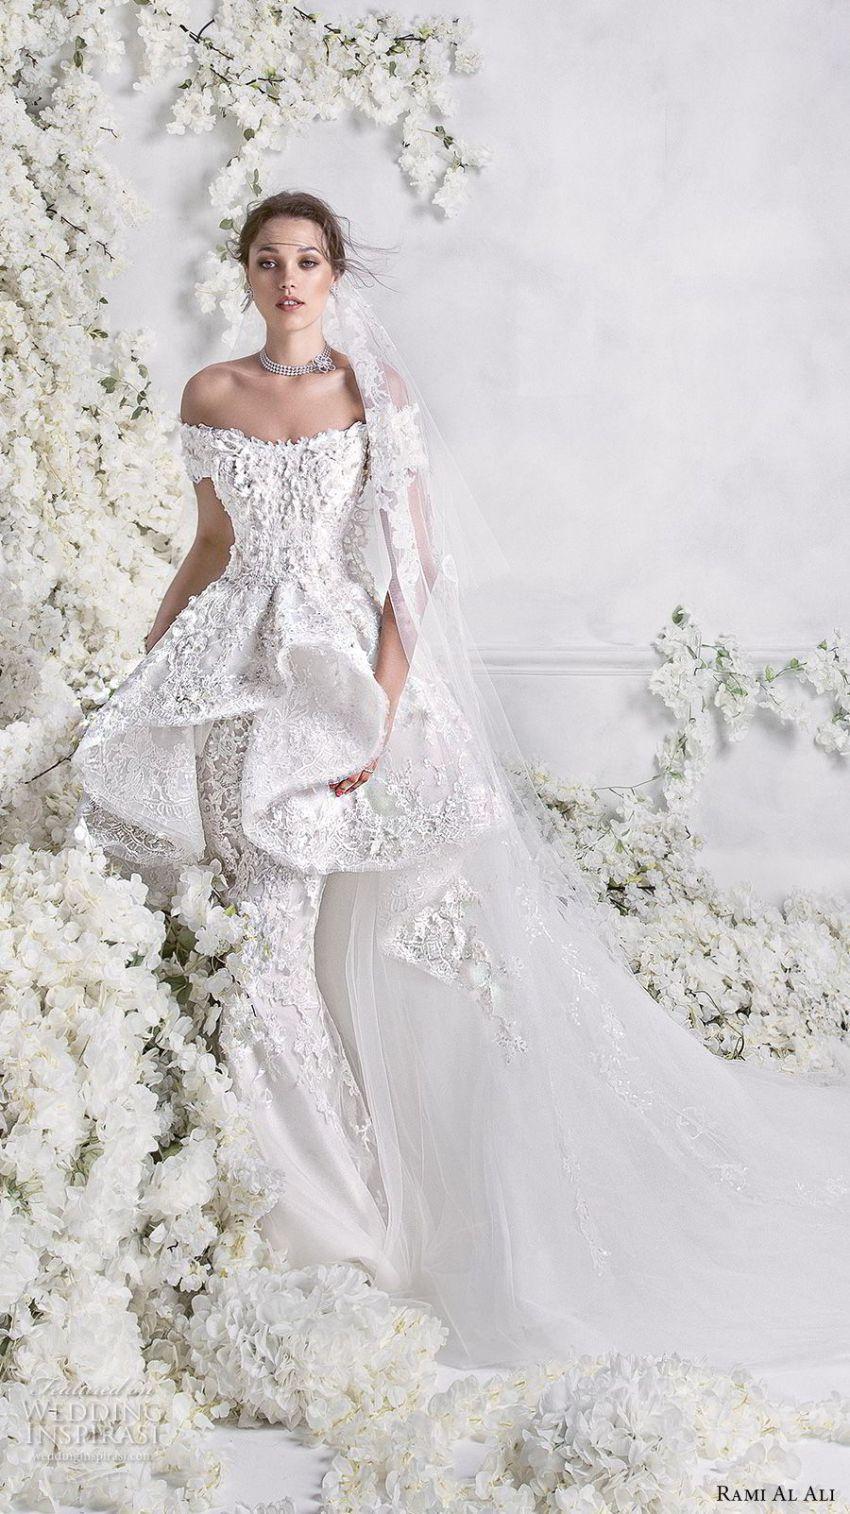 Rami al ali wedding dresses bridal pinterest mermaid